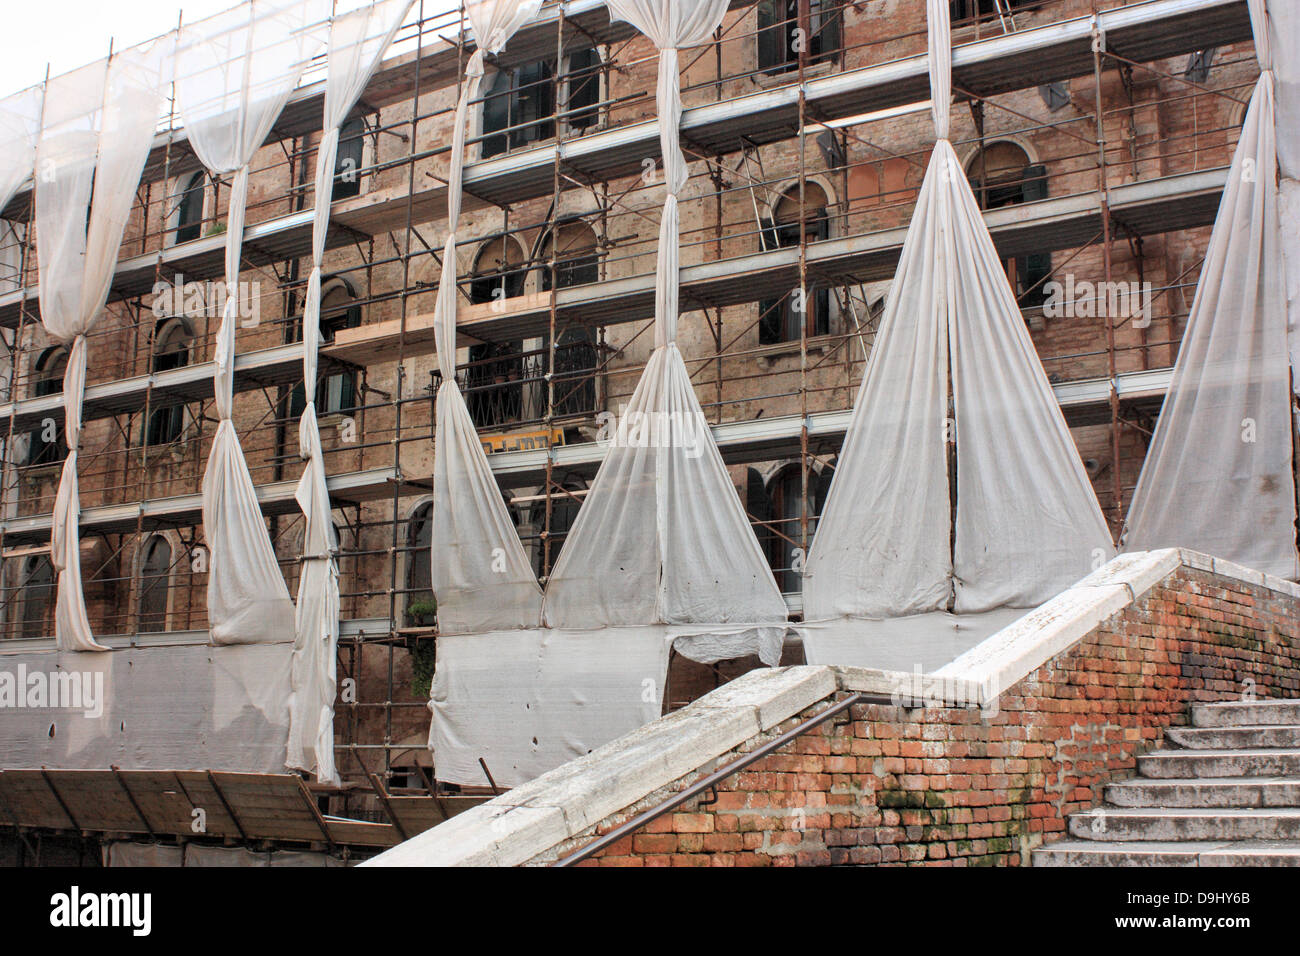 Reconstruction of a Venetian buildings (historically owned by the Scuola della Carità) - Stock Image